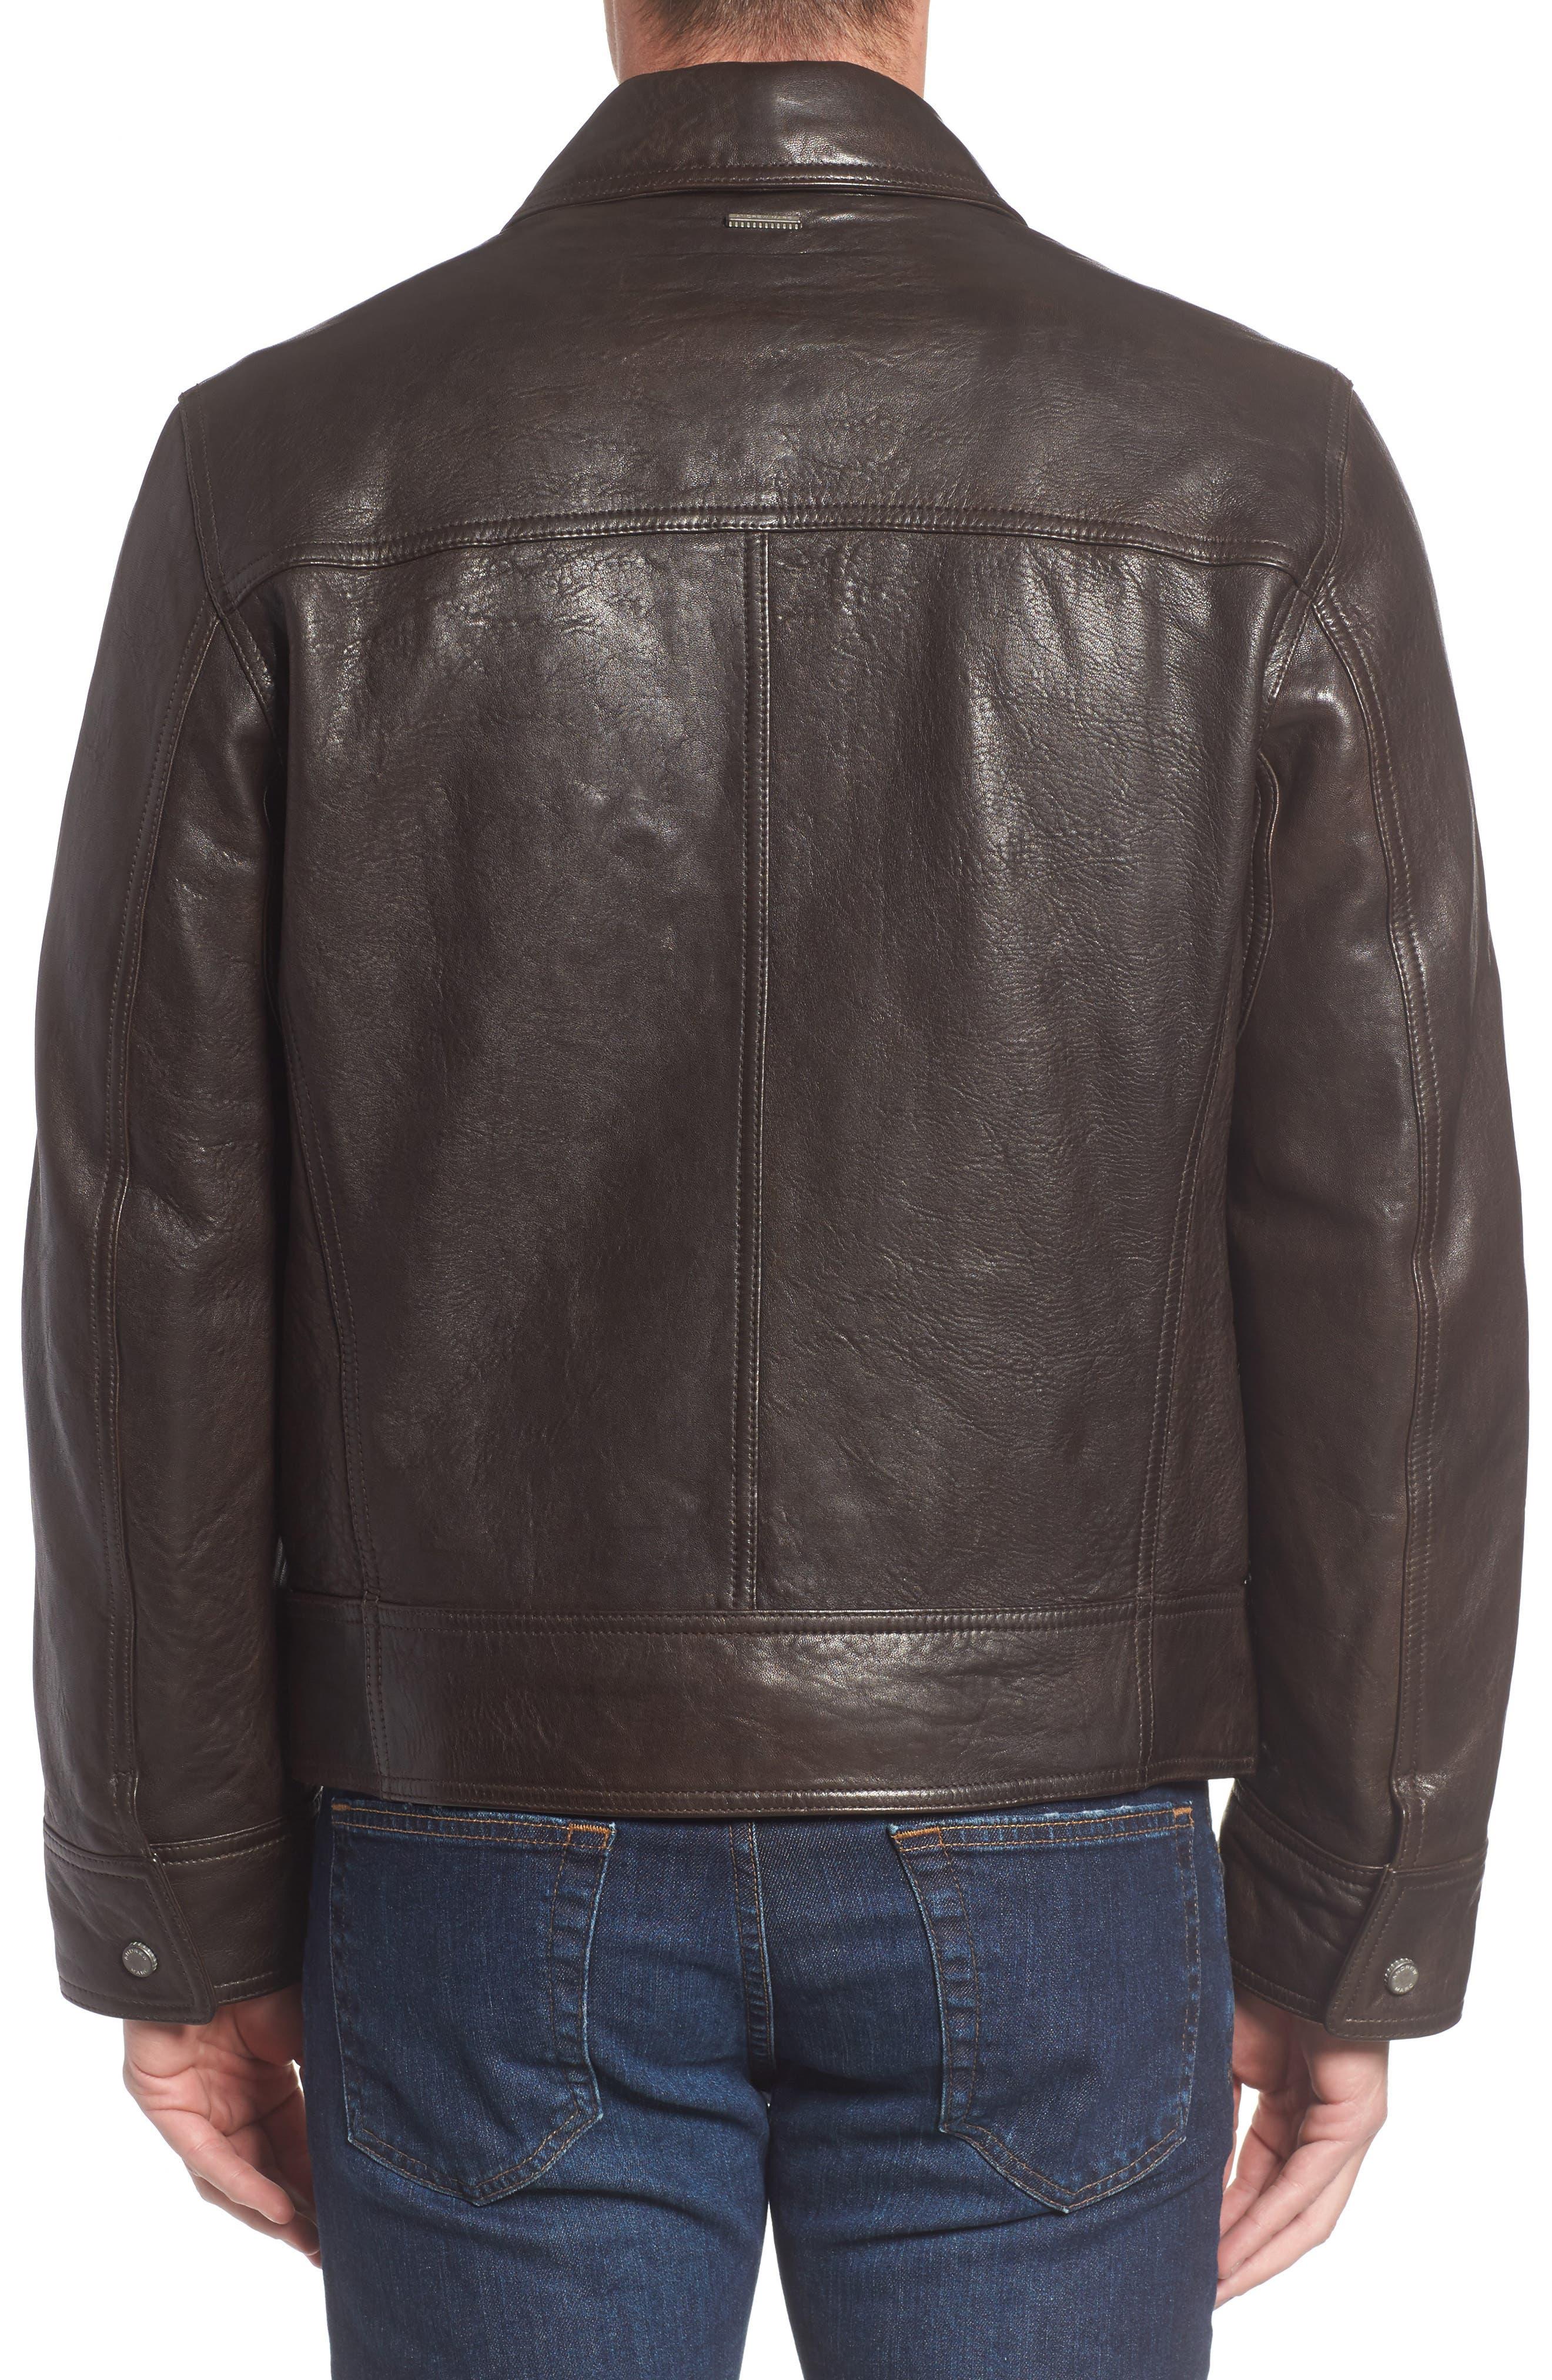 Morrison Spread Collar Leather Jacket,                             Alternate thumbnail 2, color,                             200